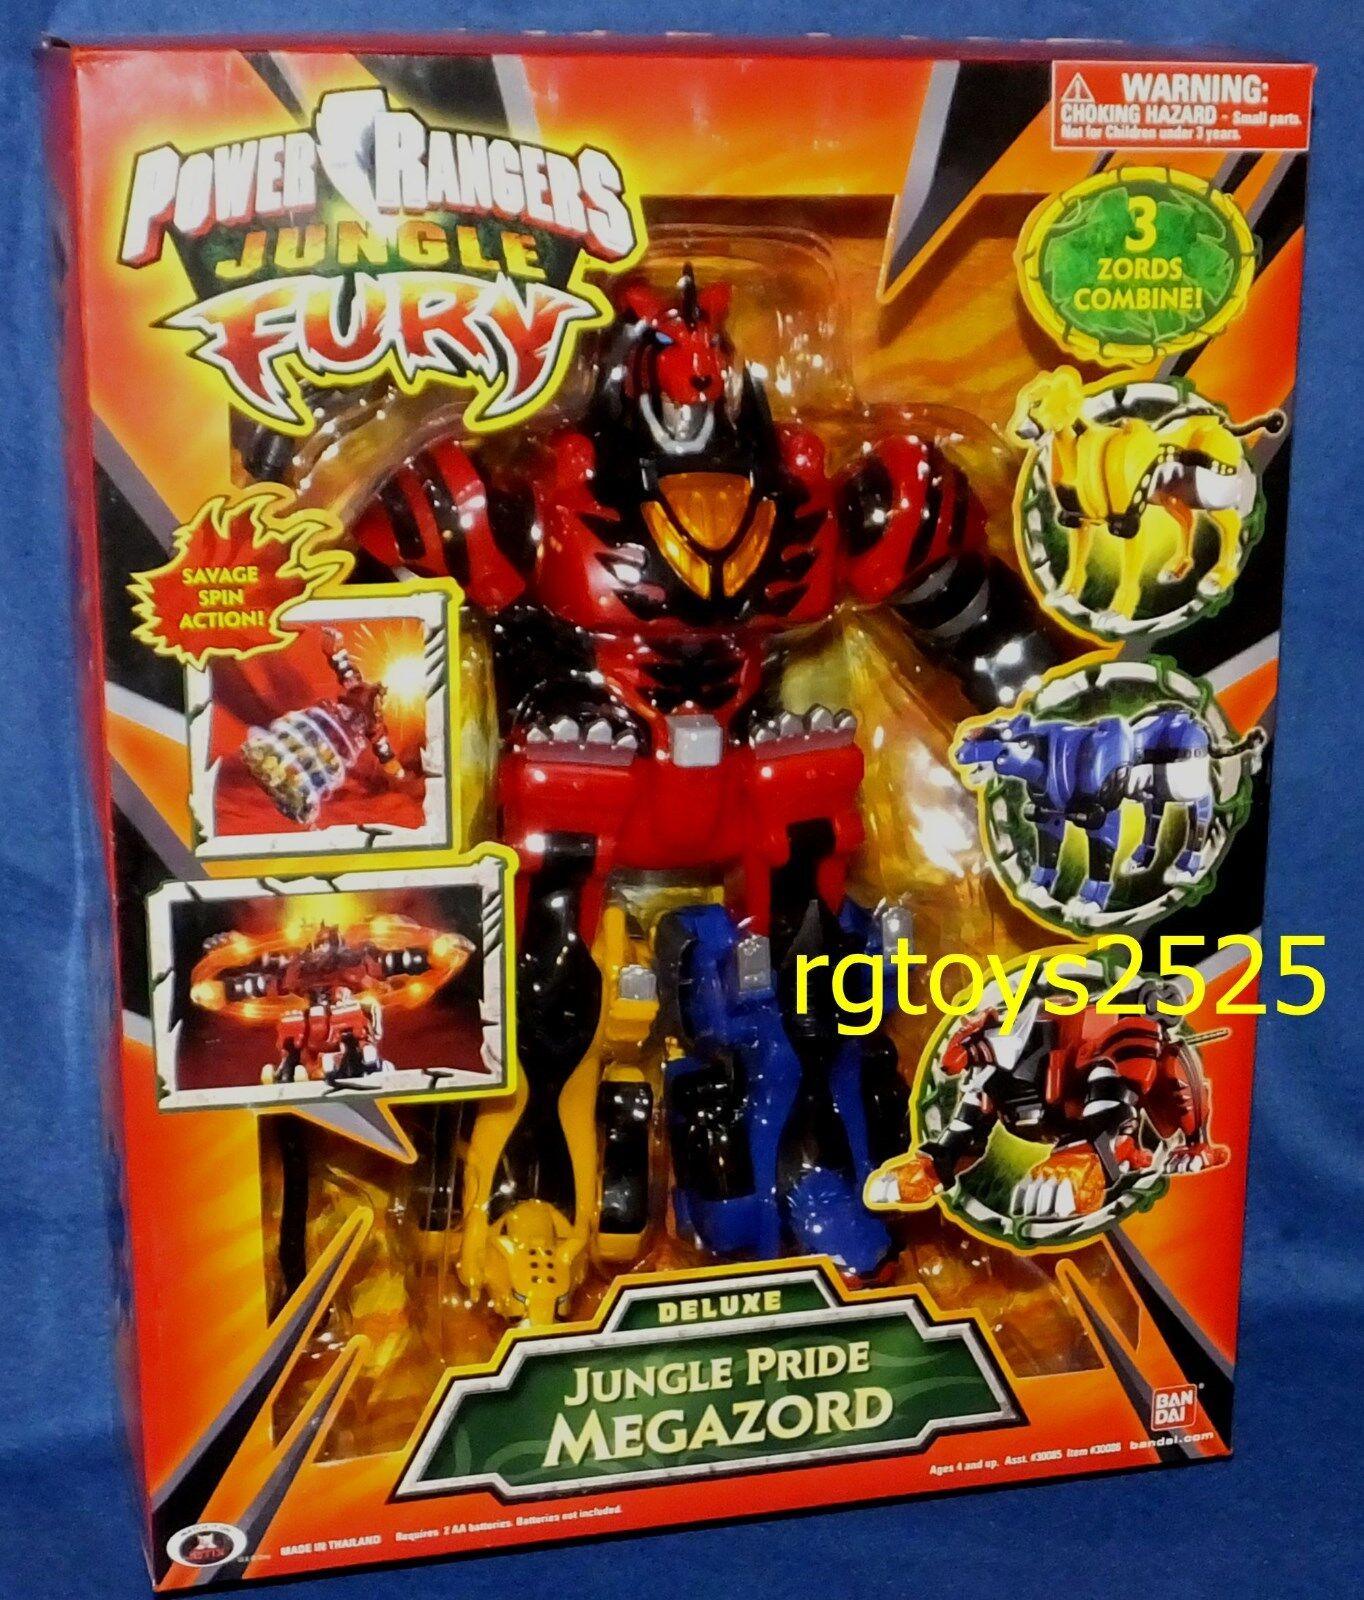 Power Rangers Jungle Fury Deluxe Jungle Pride Megazord New Factory förseglad 2007